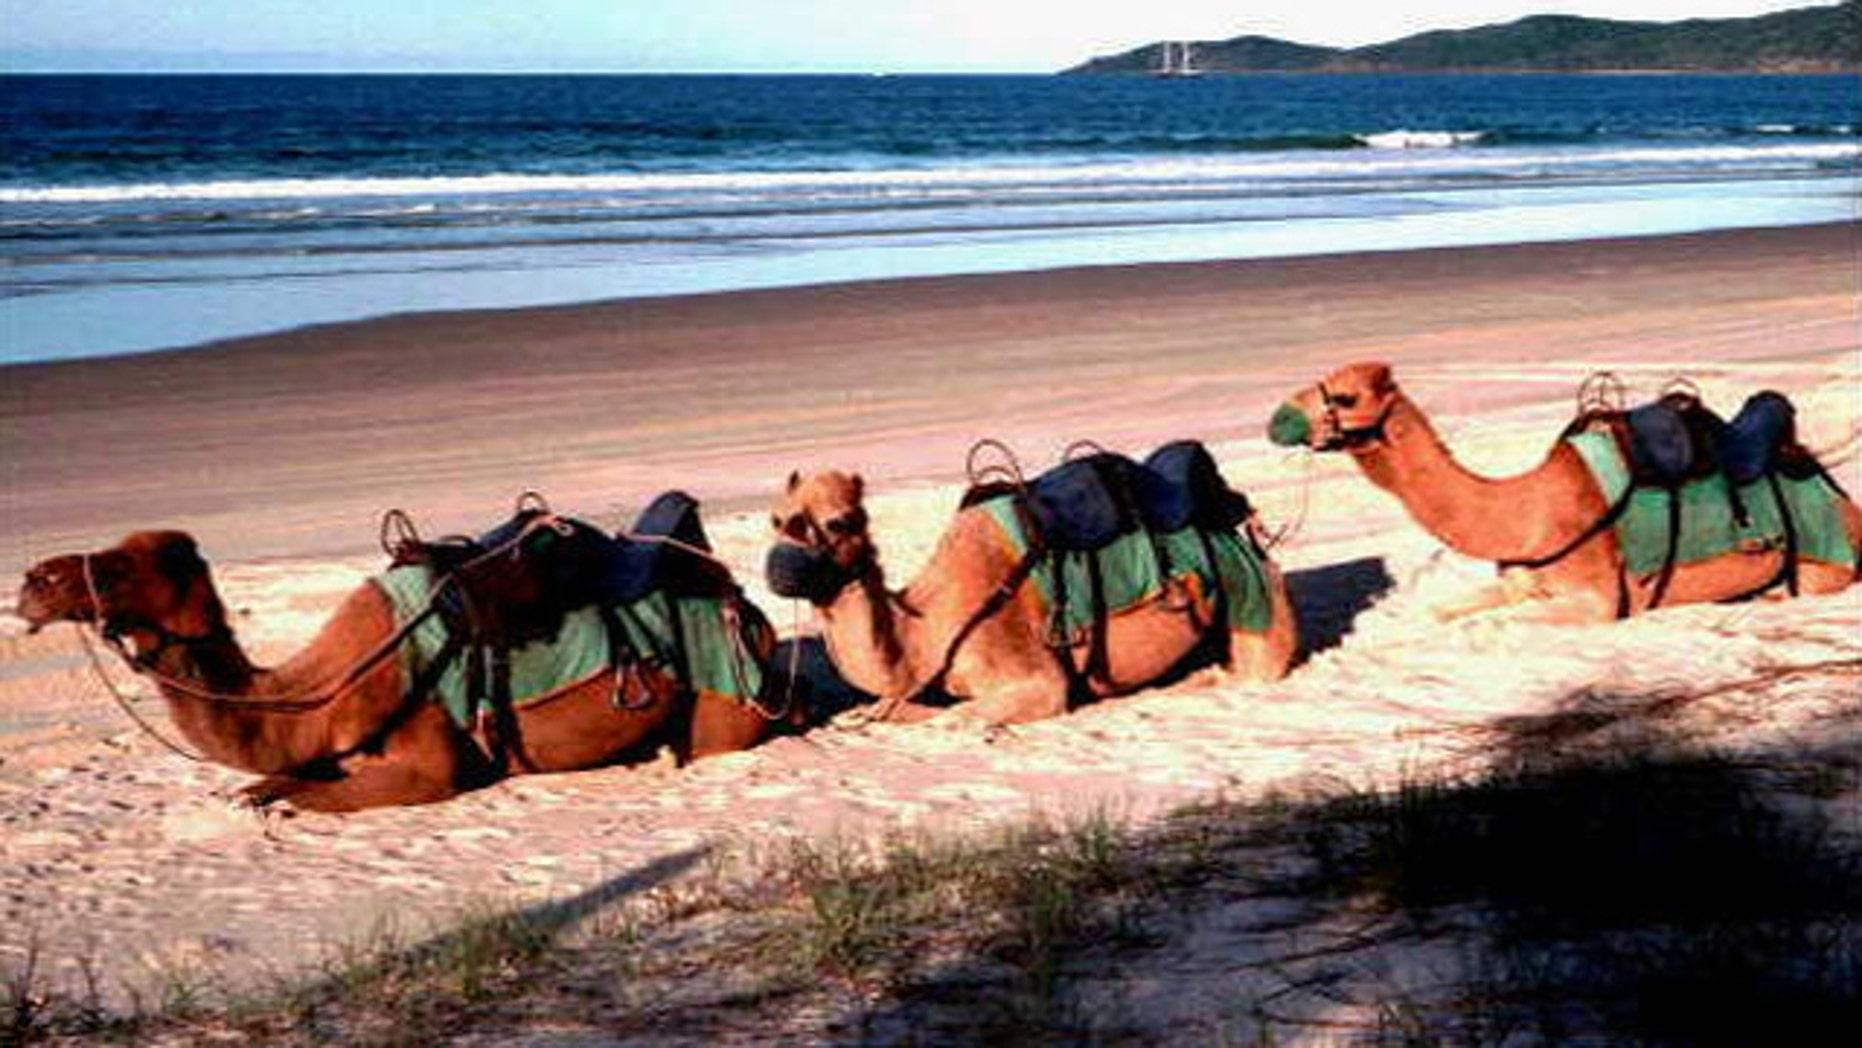 Camels sit on beach at Noosa, Queensland, Australia.